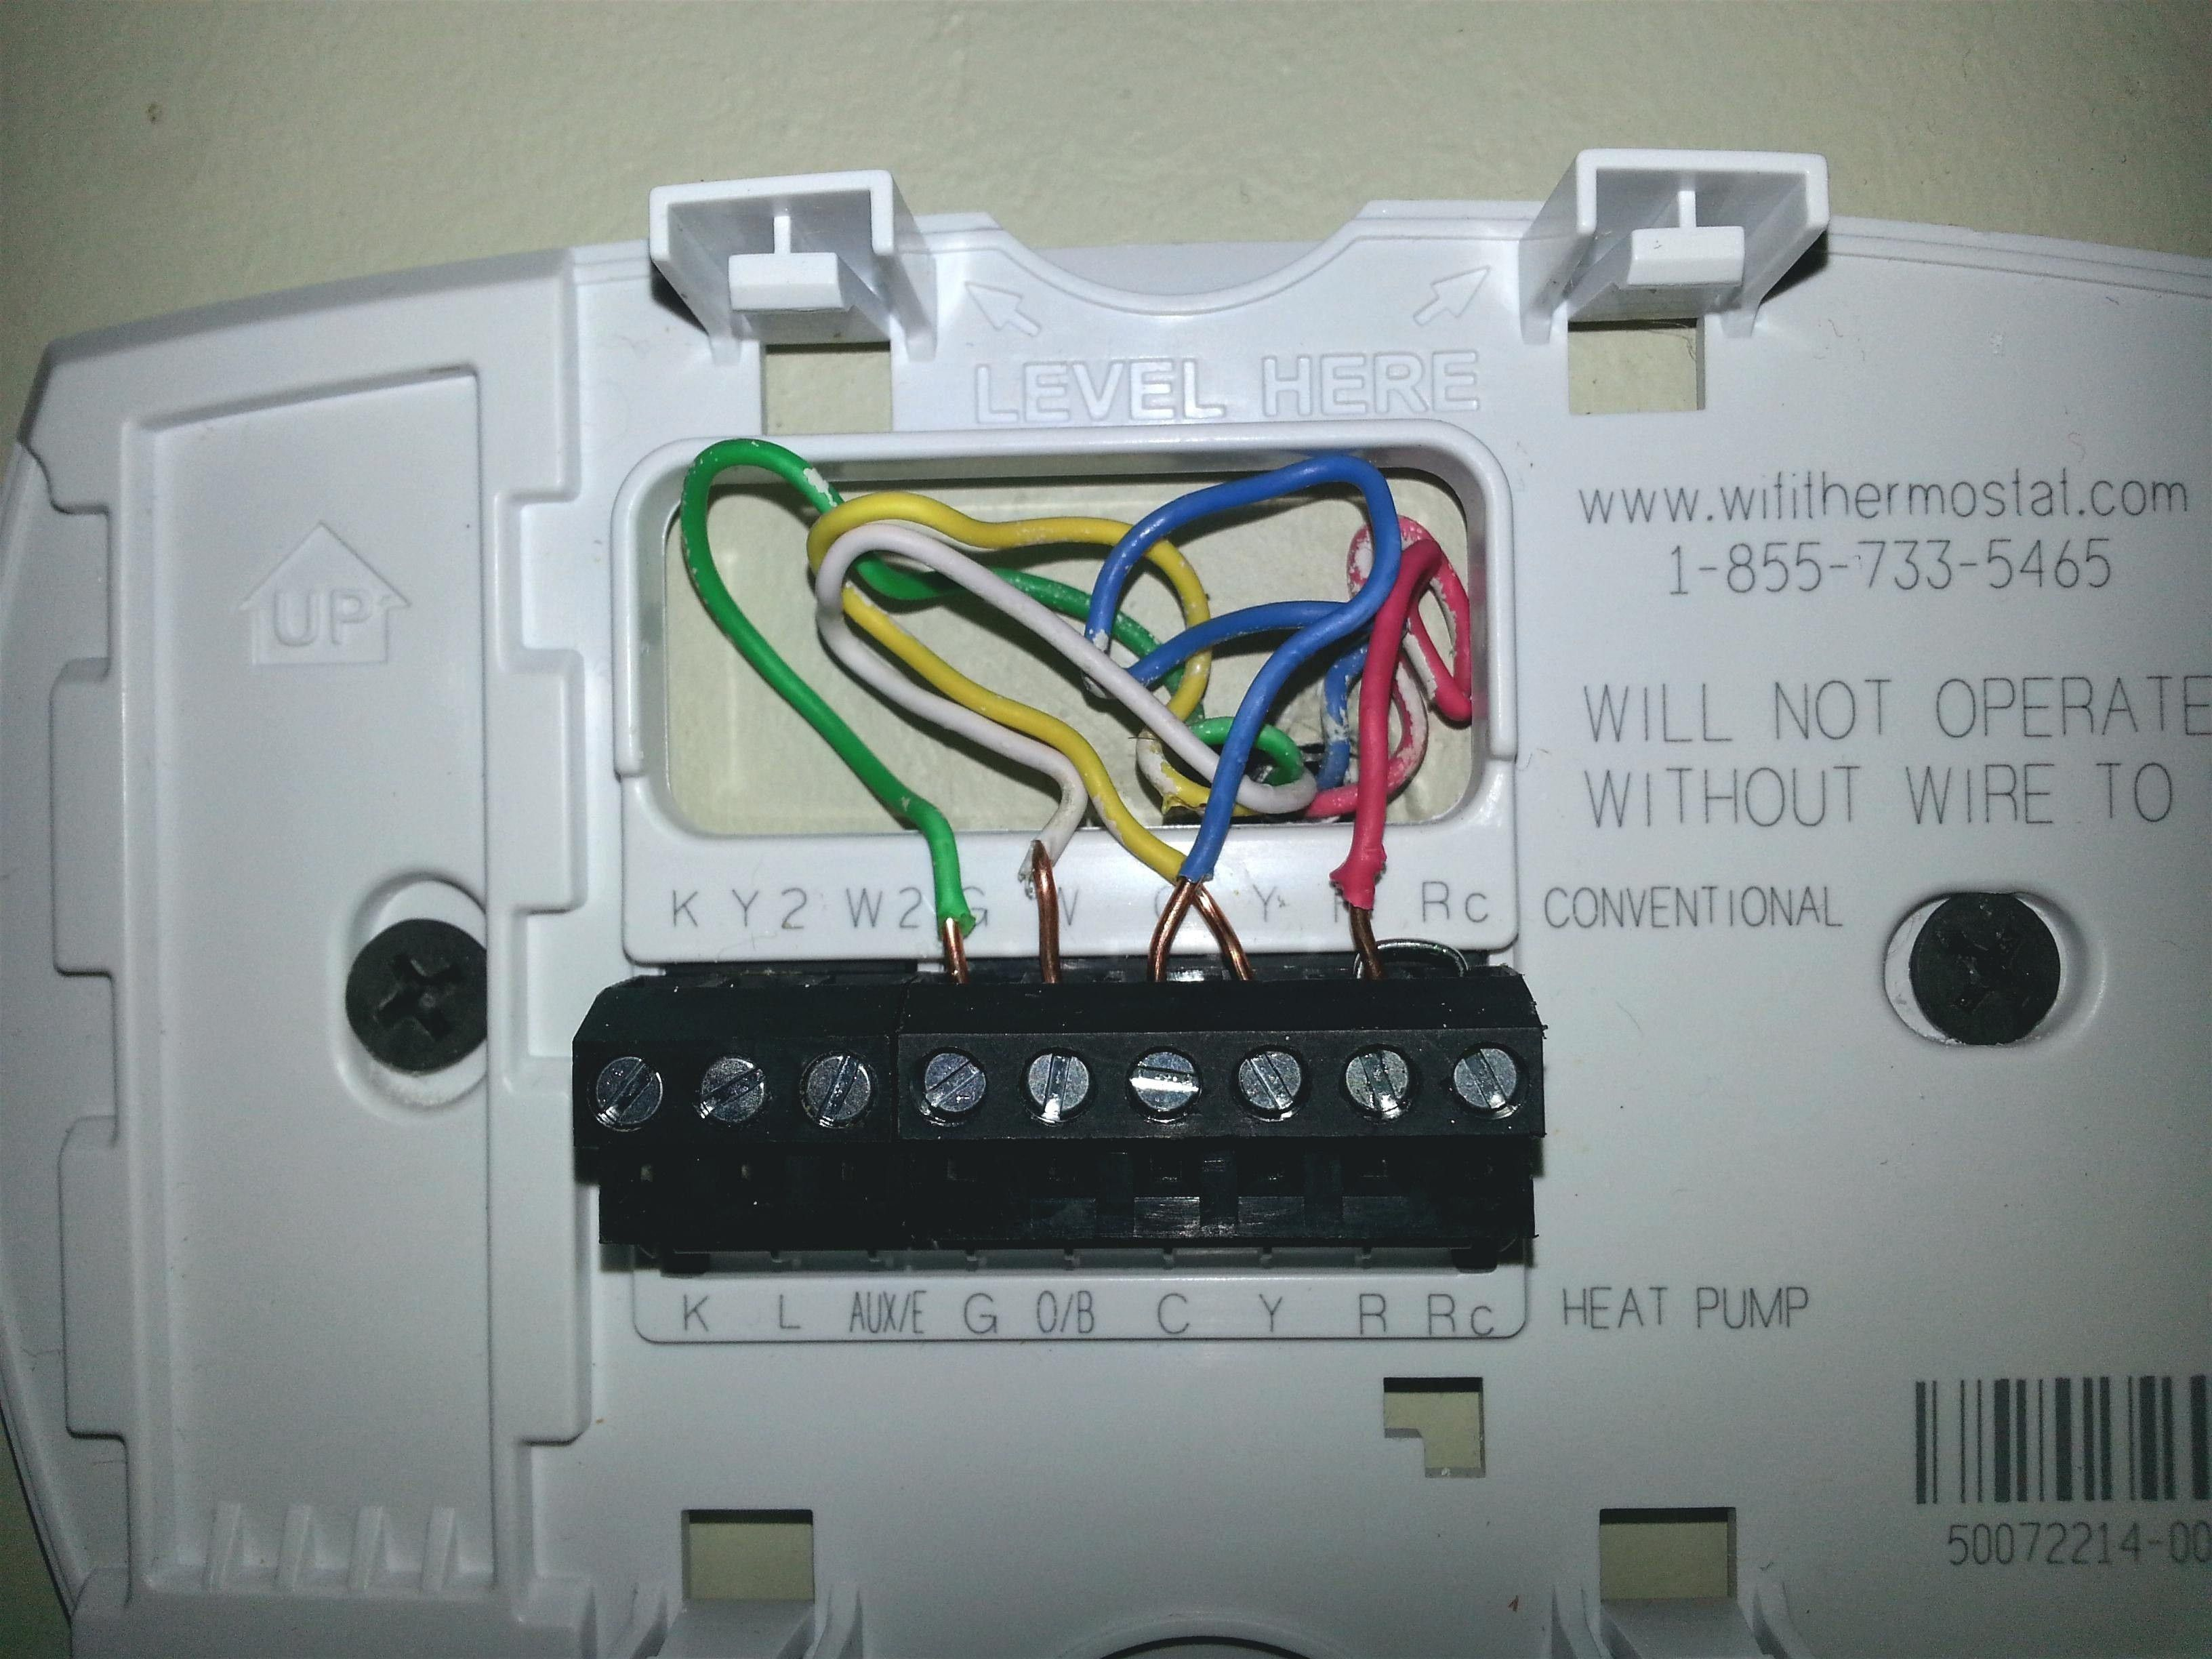 Unique Honeywell Baseboard Heater Thermostat Wiring Diagram Diagram Diagramtemplate Diagramsample Termostato Termostato Inteligente Ahorrar Dinero